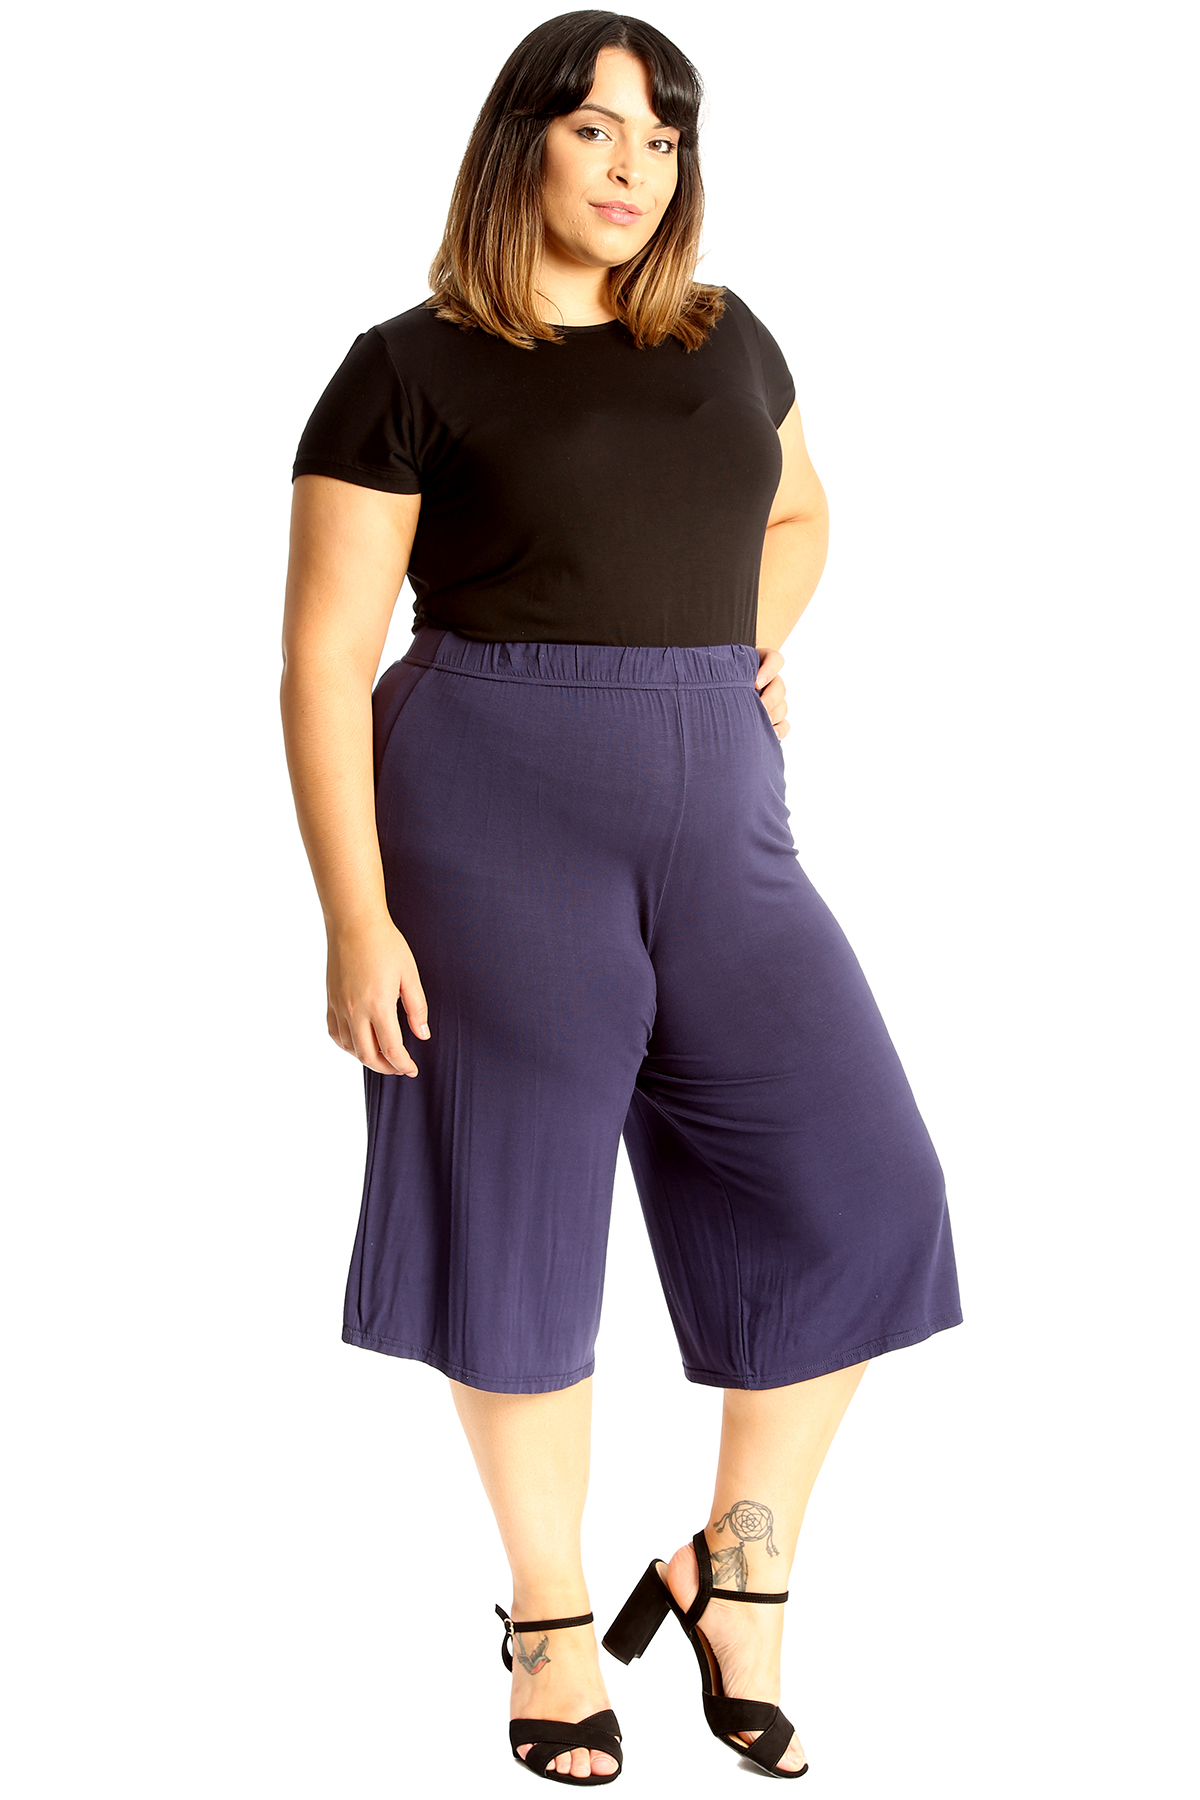 New-Womens-Plus-Size-Culottes-Ladies-Plain-Shorts-Palazzo-Elastic-Pants-Summer thumbnail 67